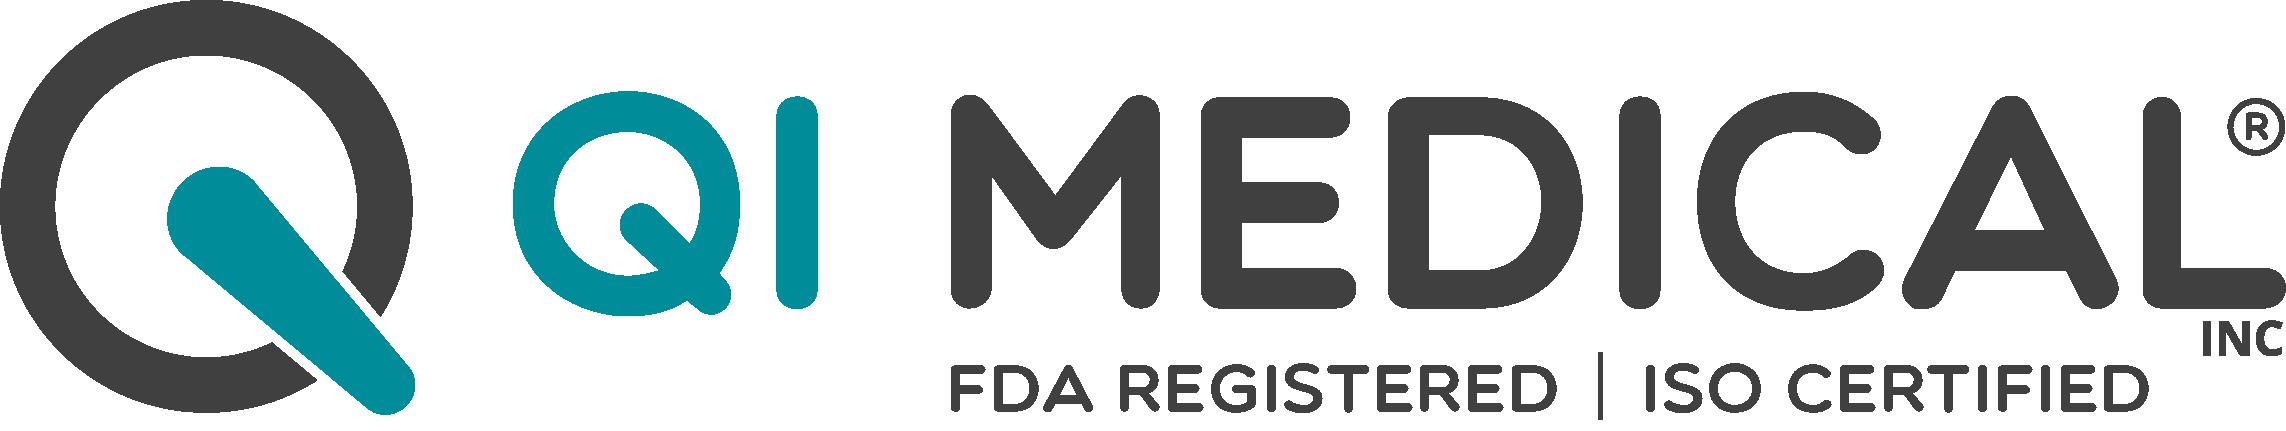 QI_LOGO_COLOR_Horizontal_FDA_WEB_2019_logo.png